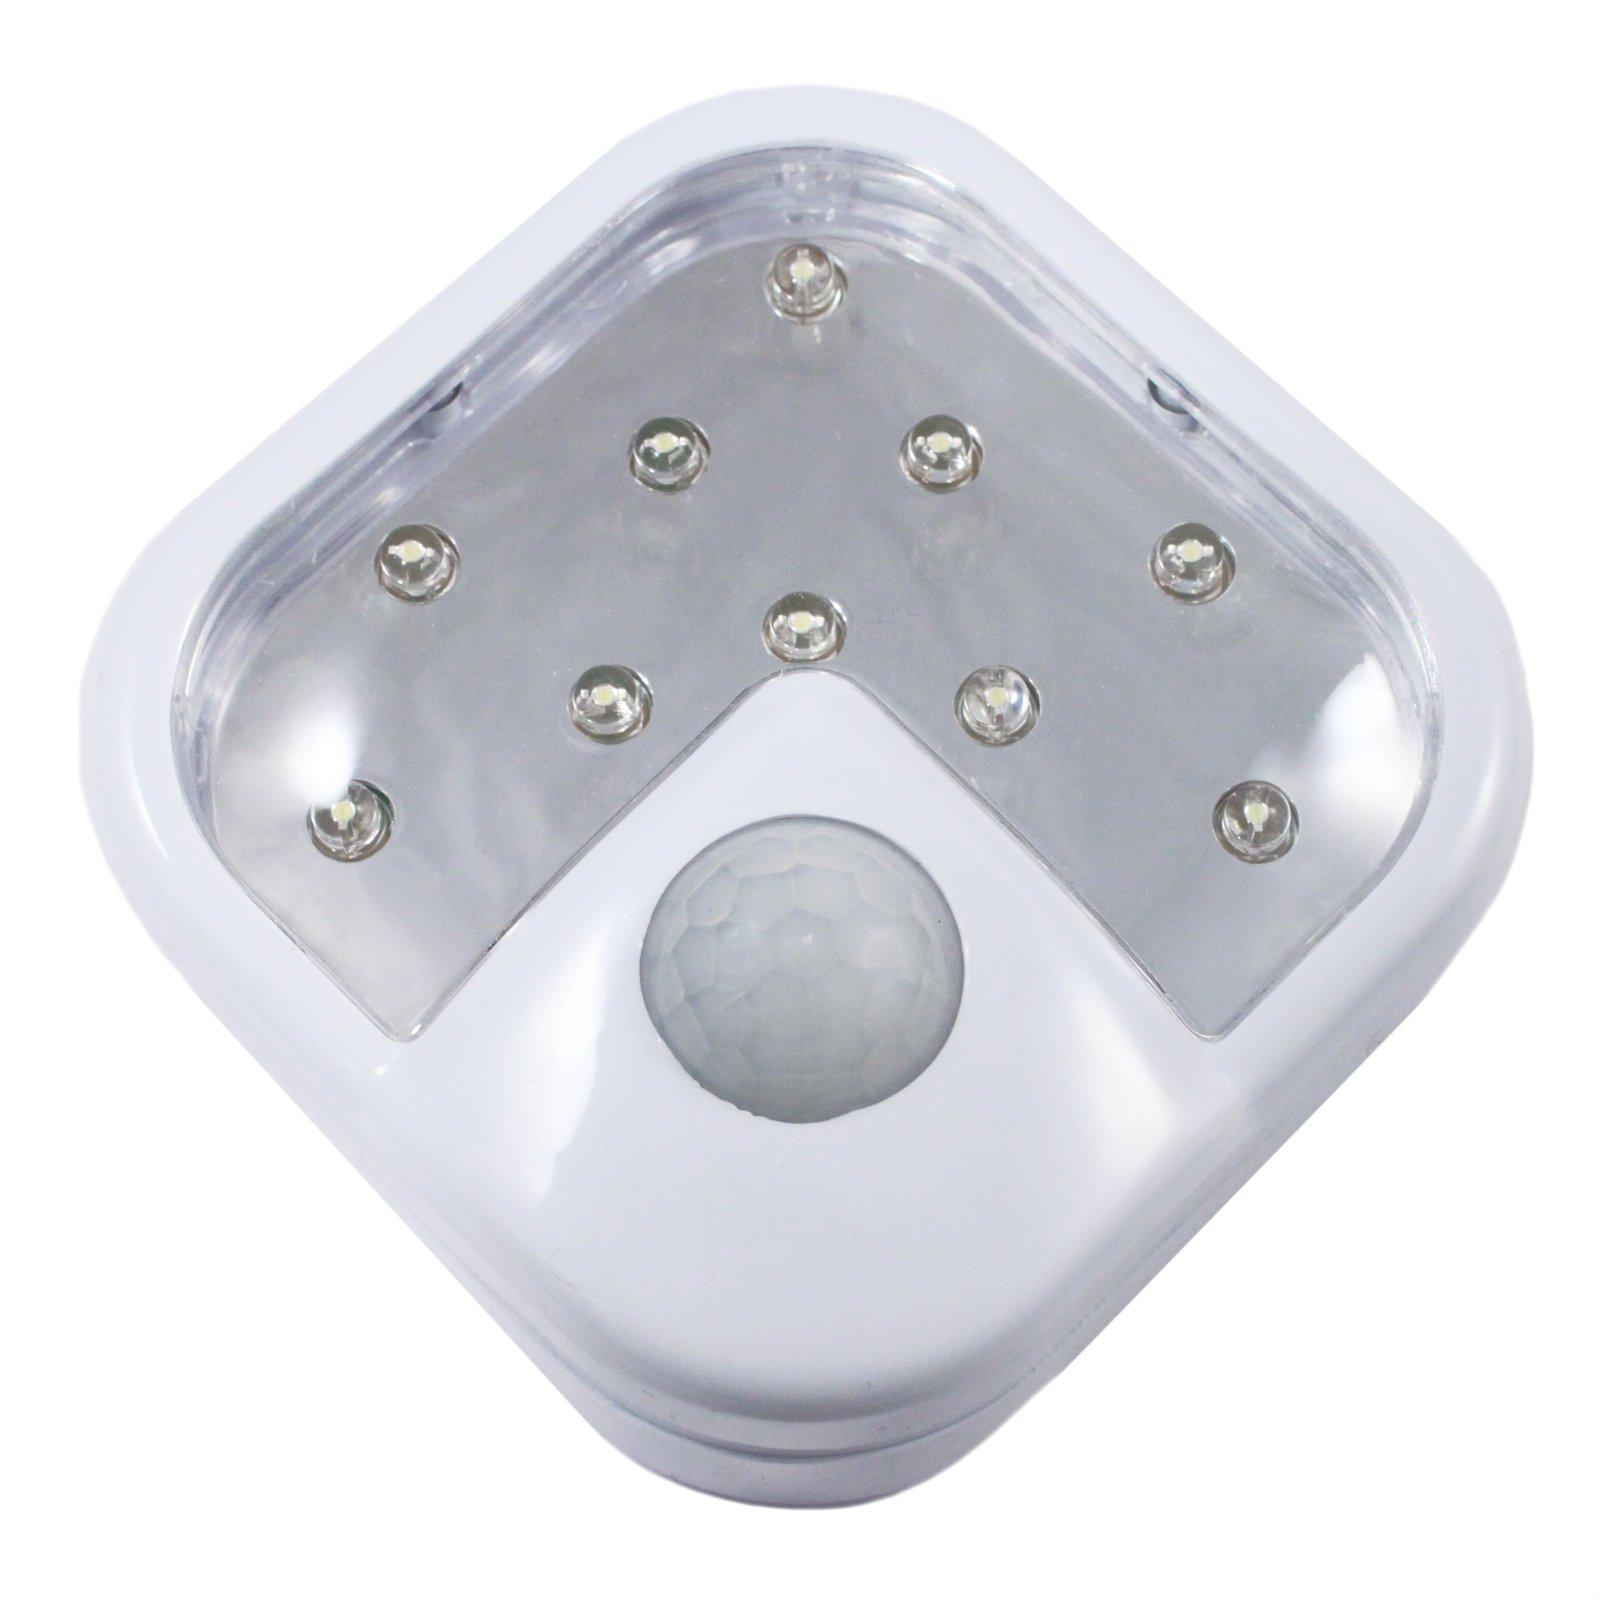 10 LED Wireless Motion Sensor Light Super Bright Security